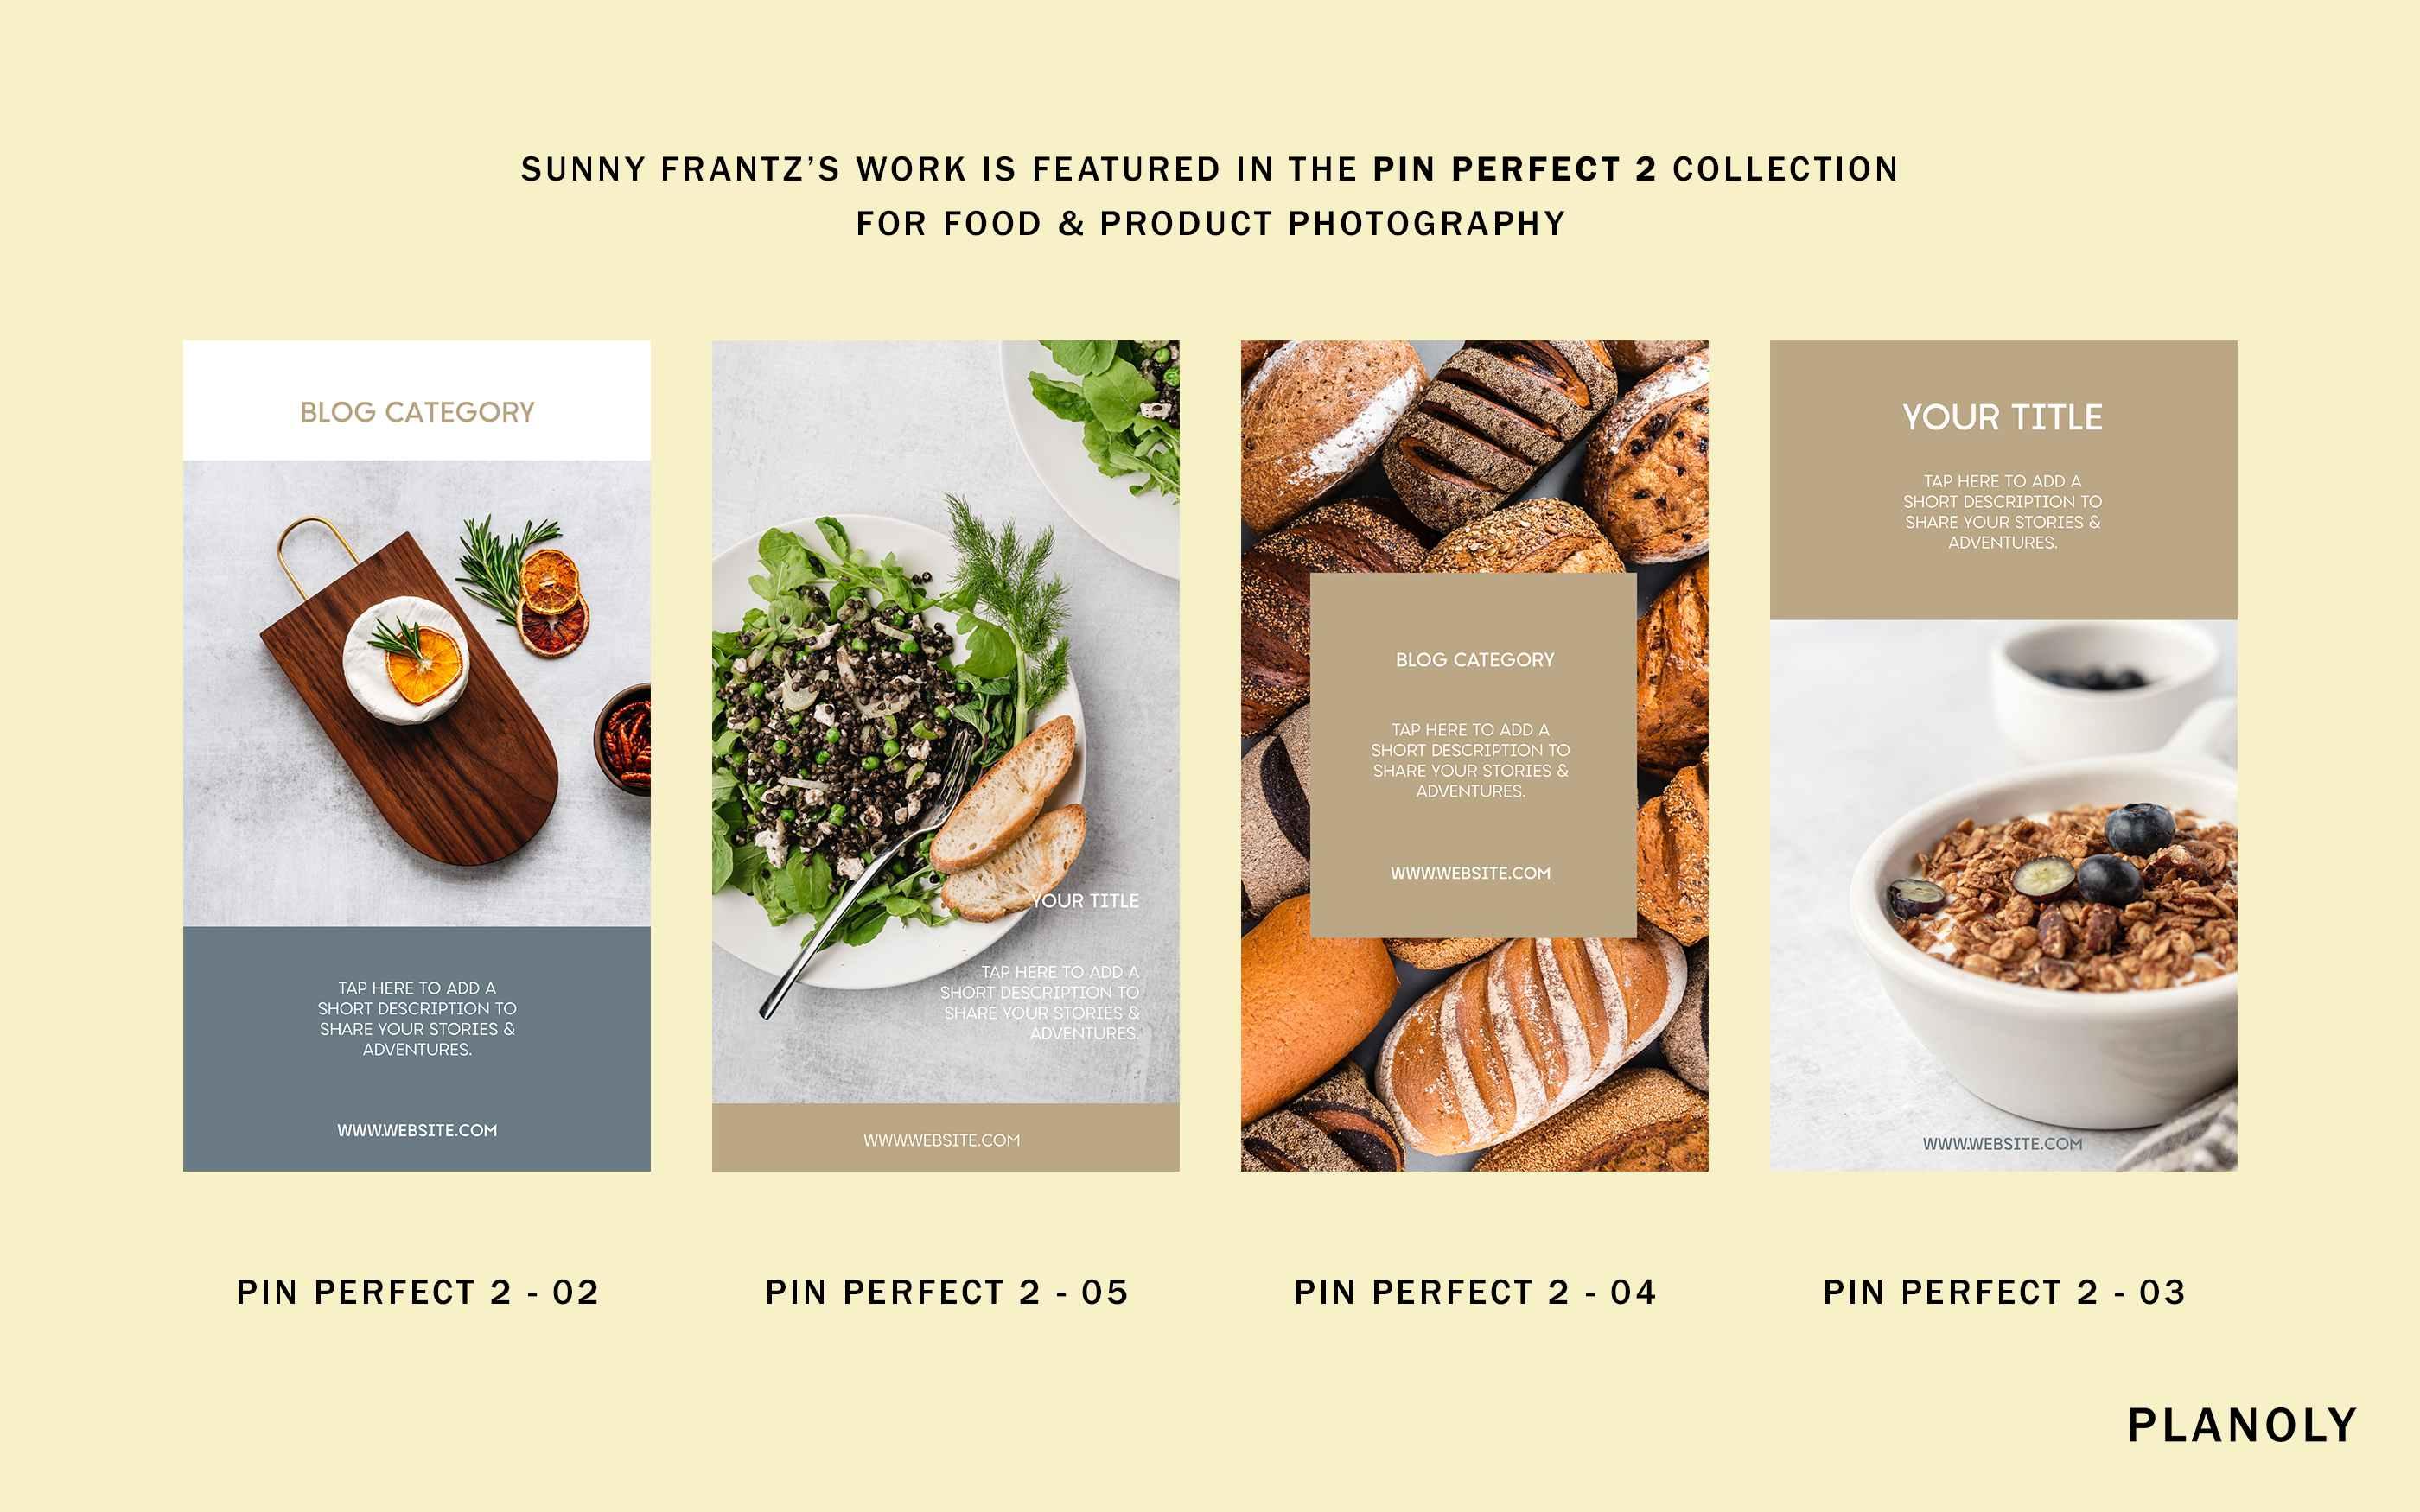 PLANOLY - Blog Post - Food Styling Tips - Sunny Frantz - Image 5